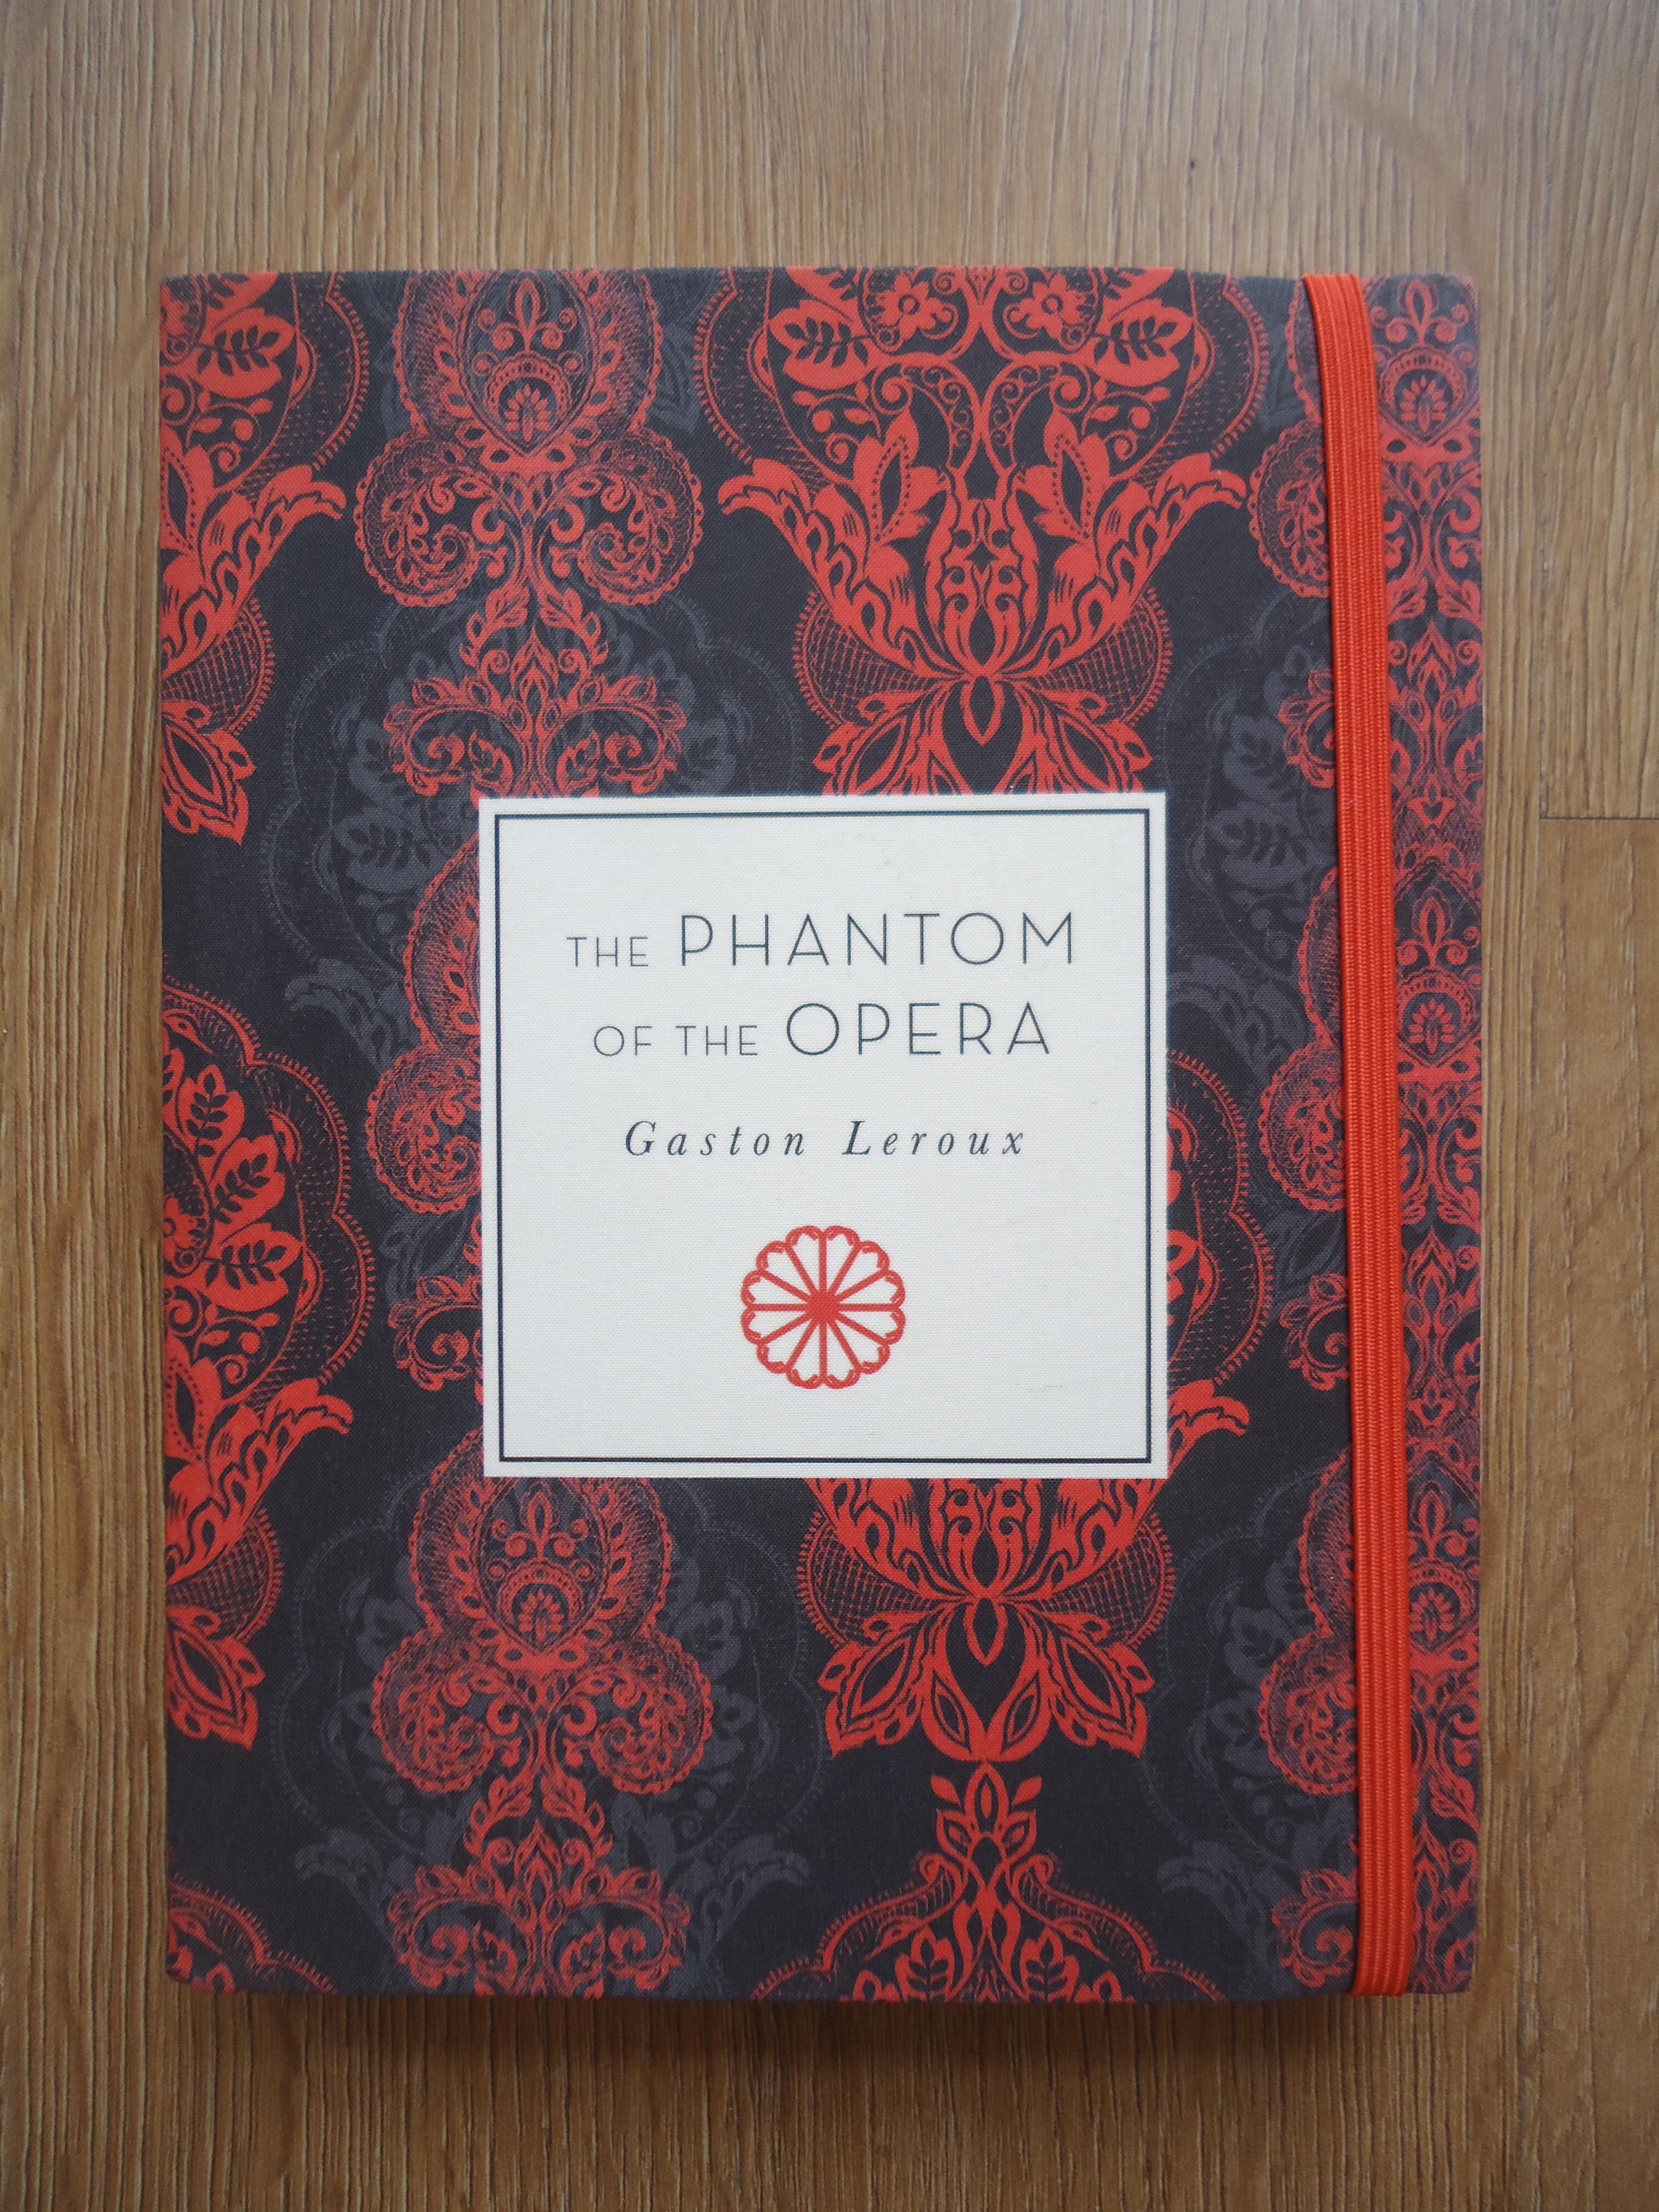 backpack, Phantom, Opera, Phantom of the Opera, Le Fantôme de l'Opéra, classics, novel, period novel, pretty book, special edition, gifts